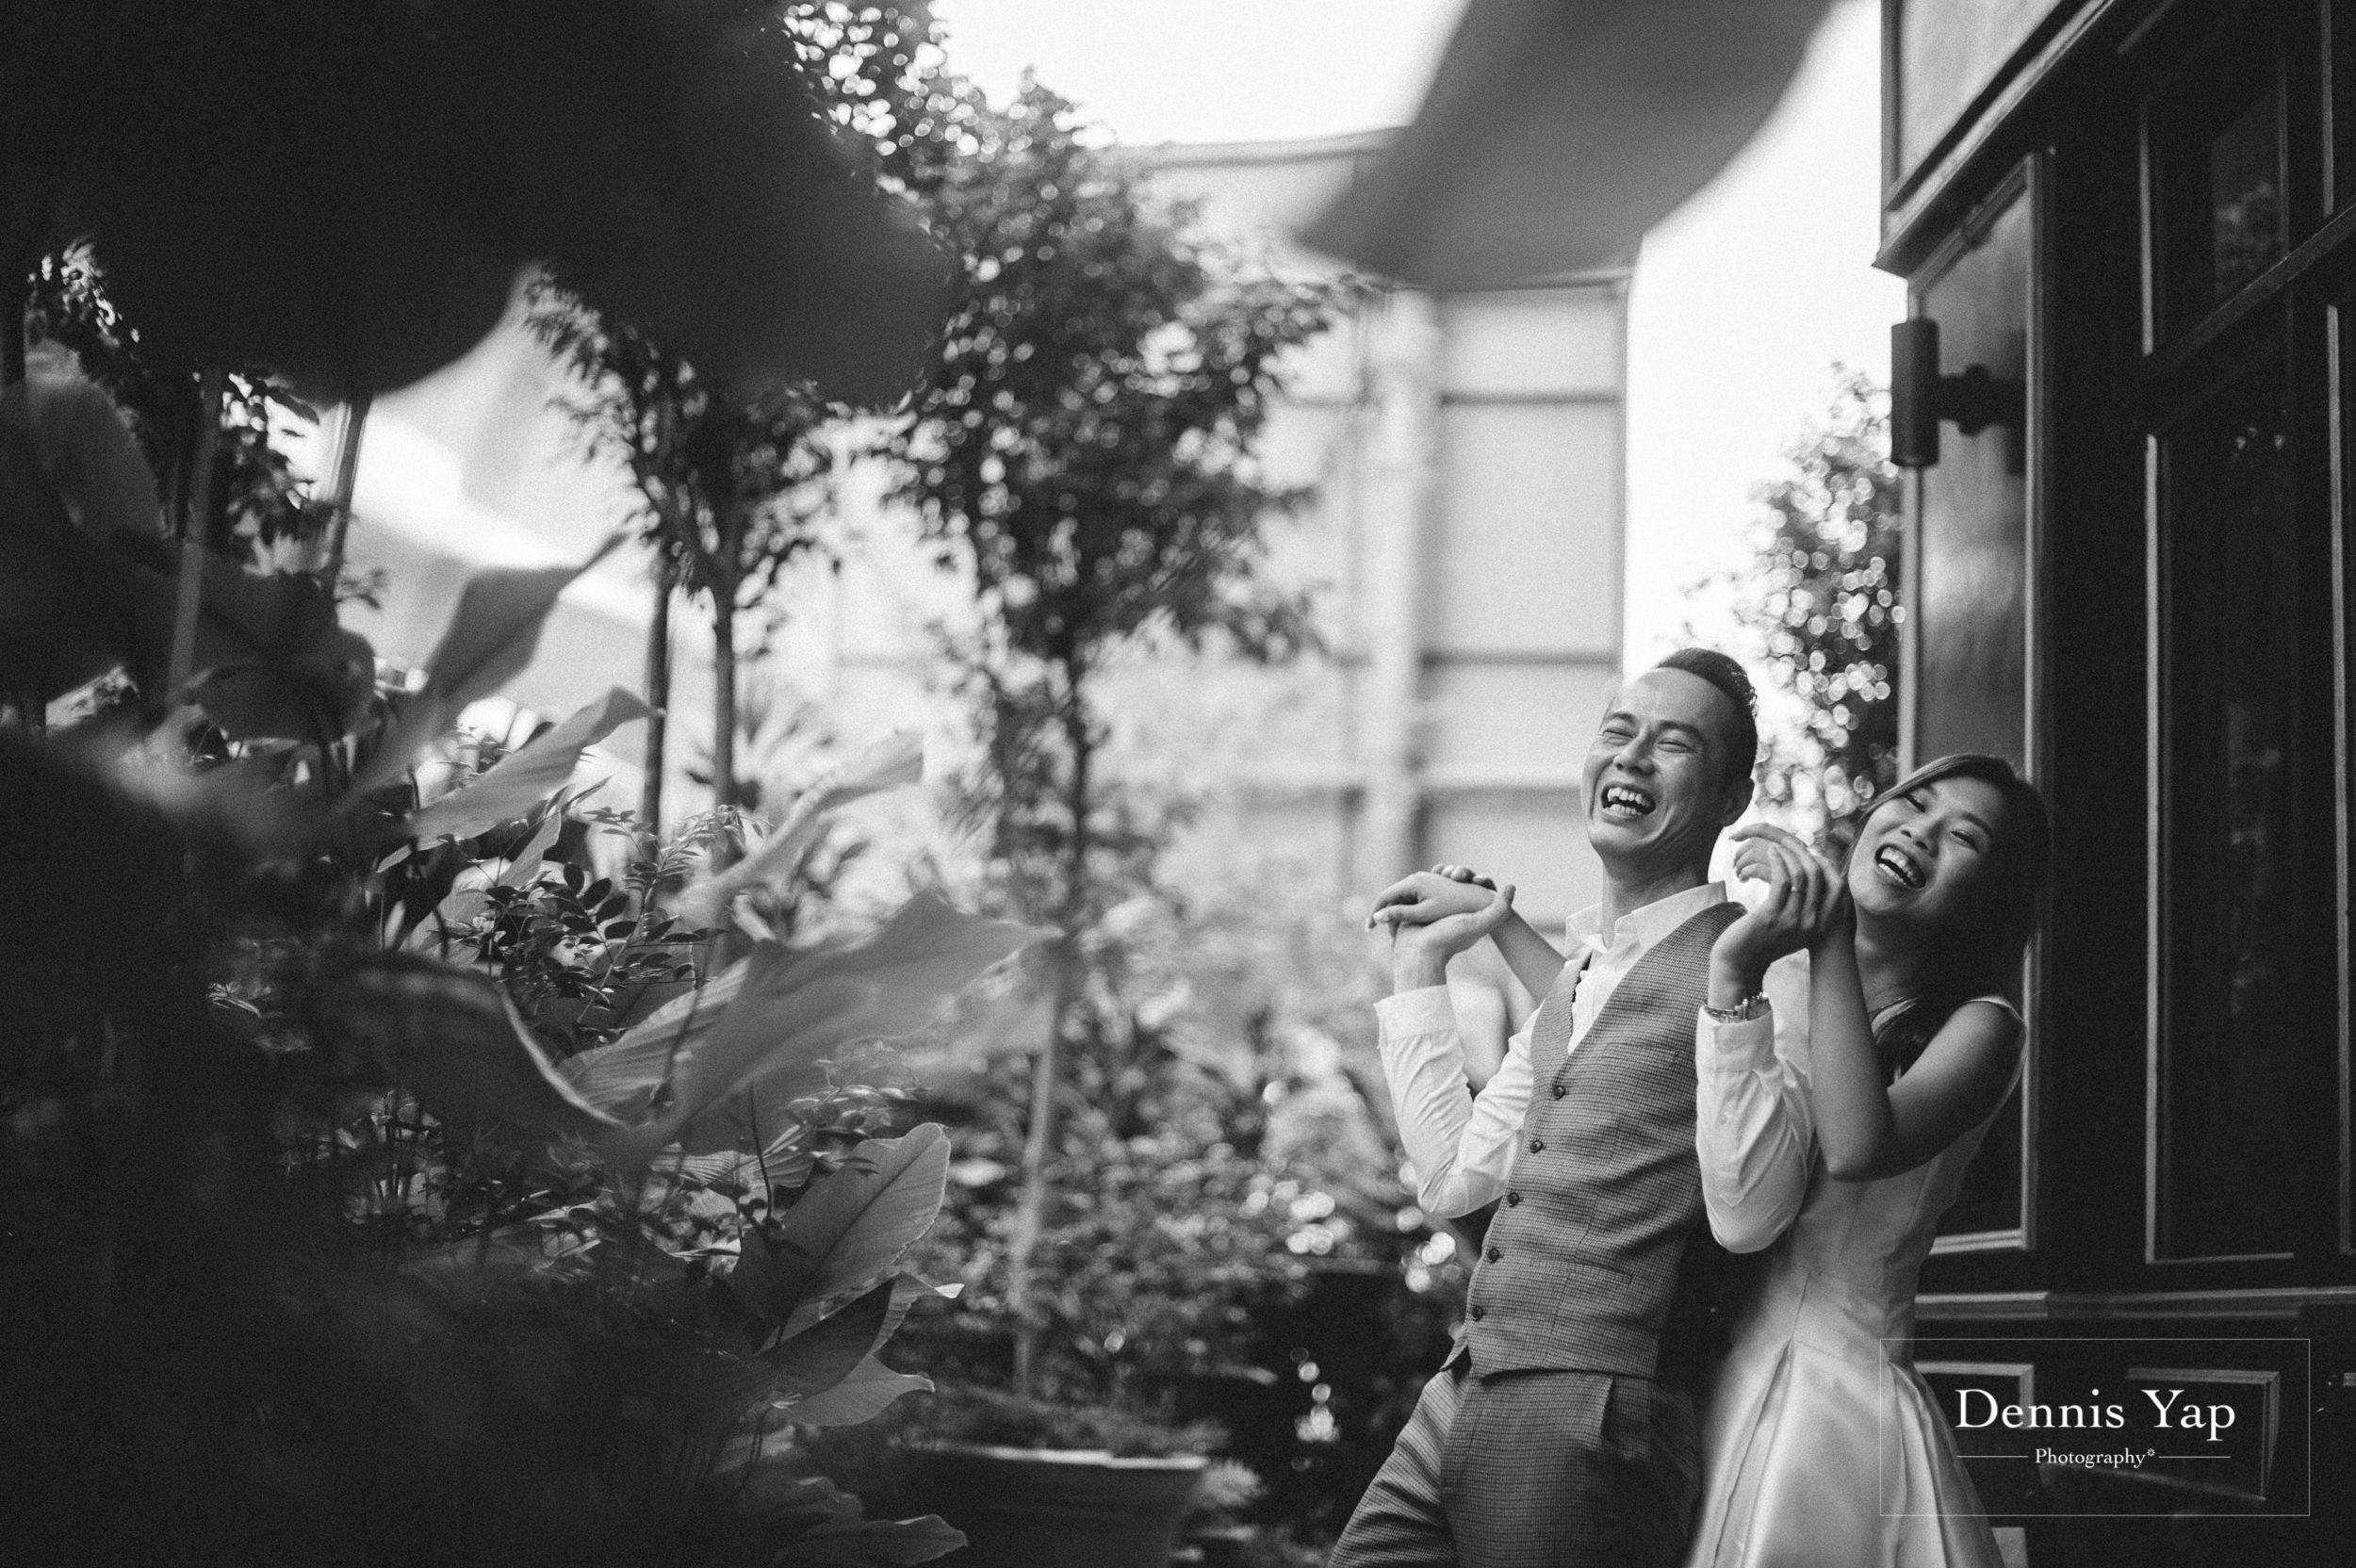 patrick samantha surprise wedding party cafe cafe kuala lumpur dennis yap photography-3.jpg